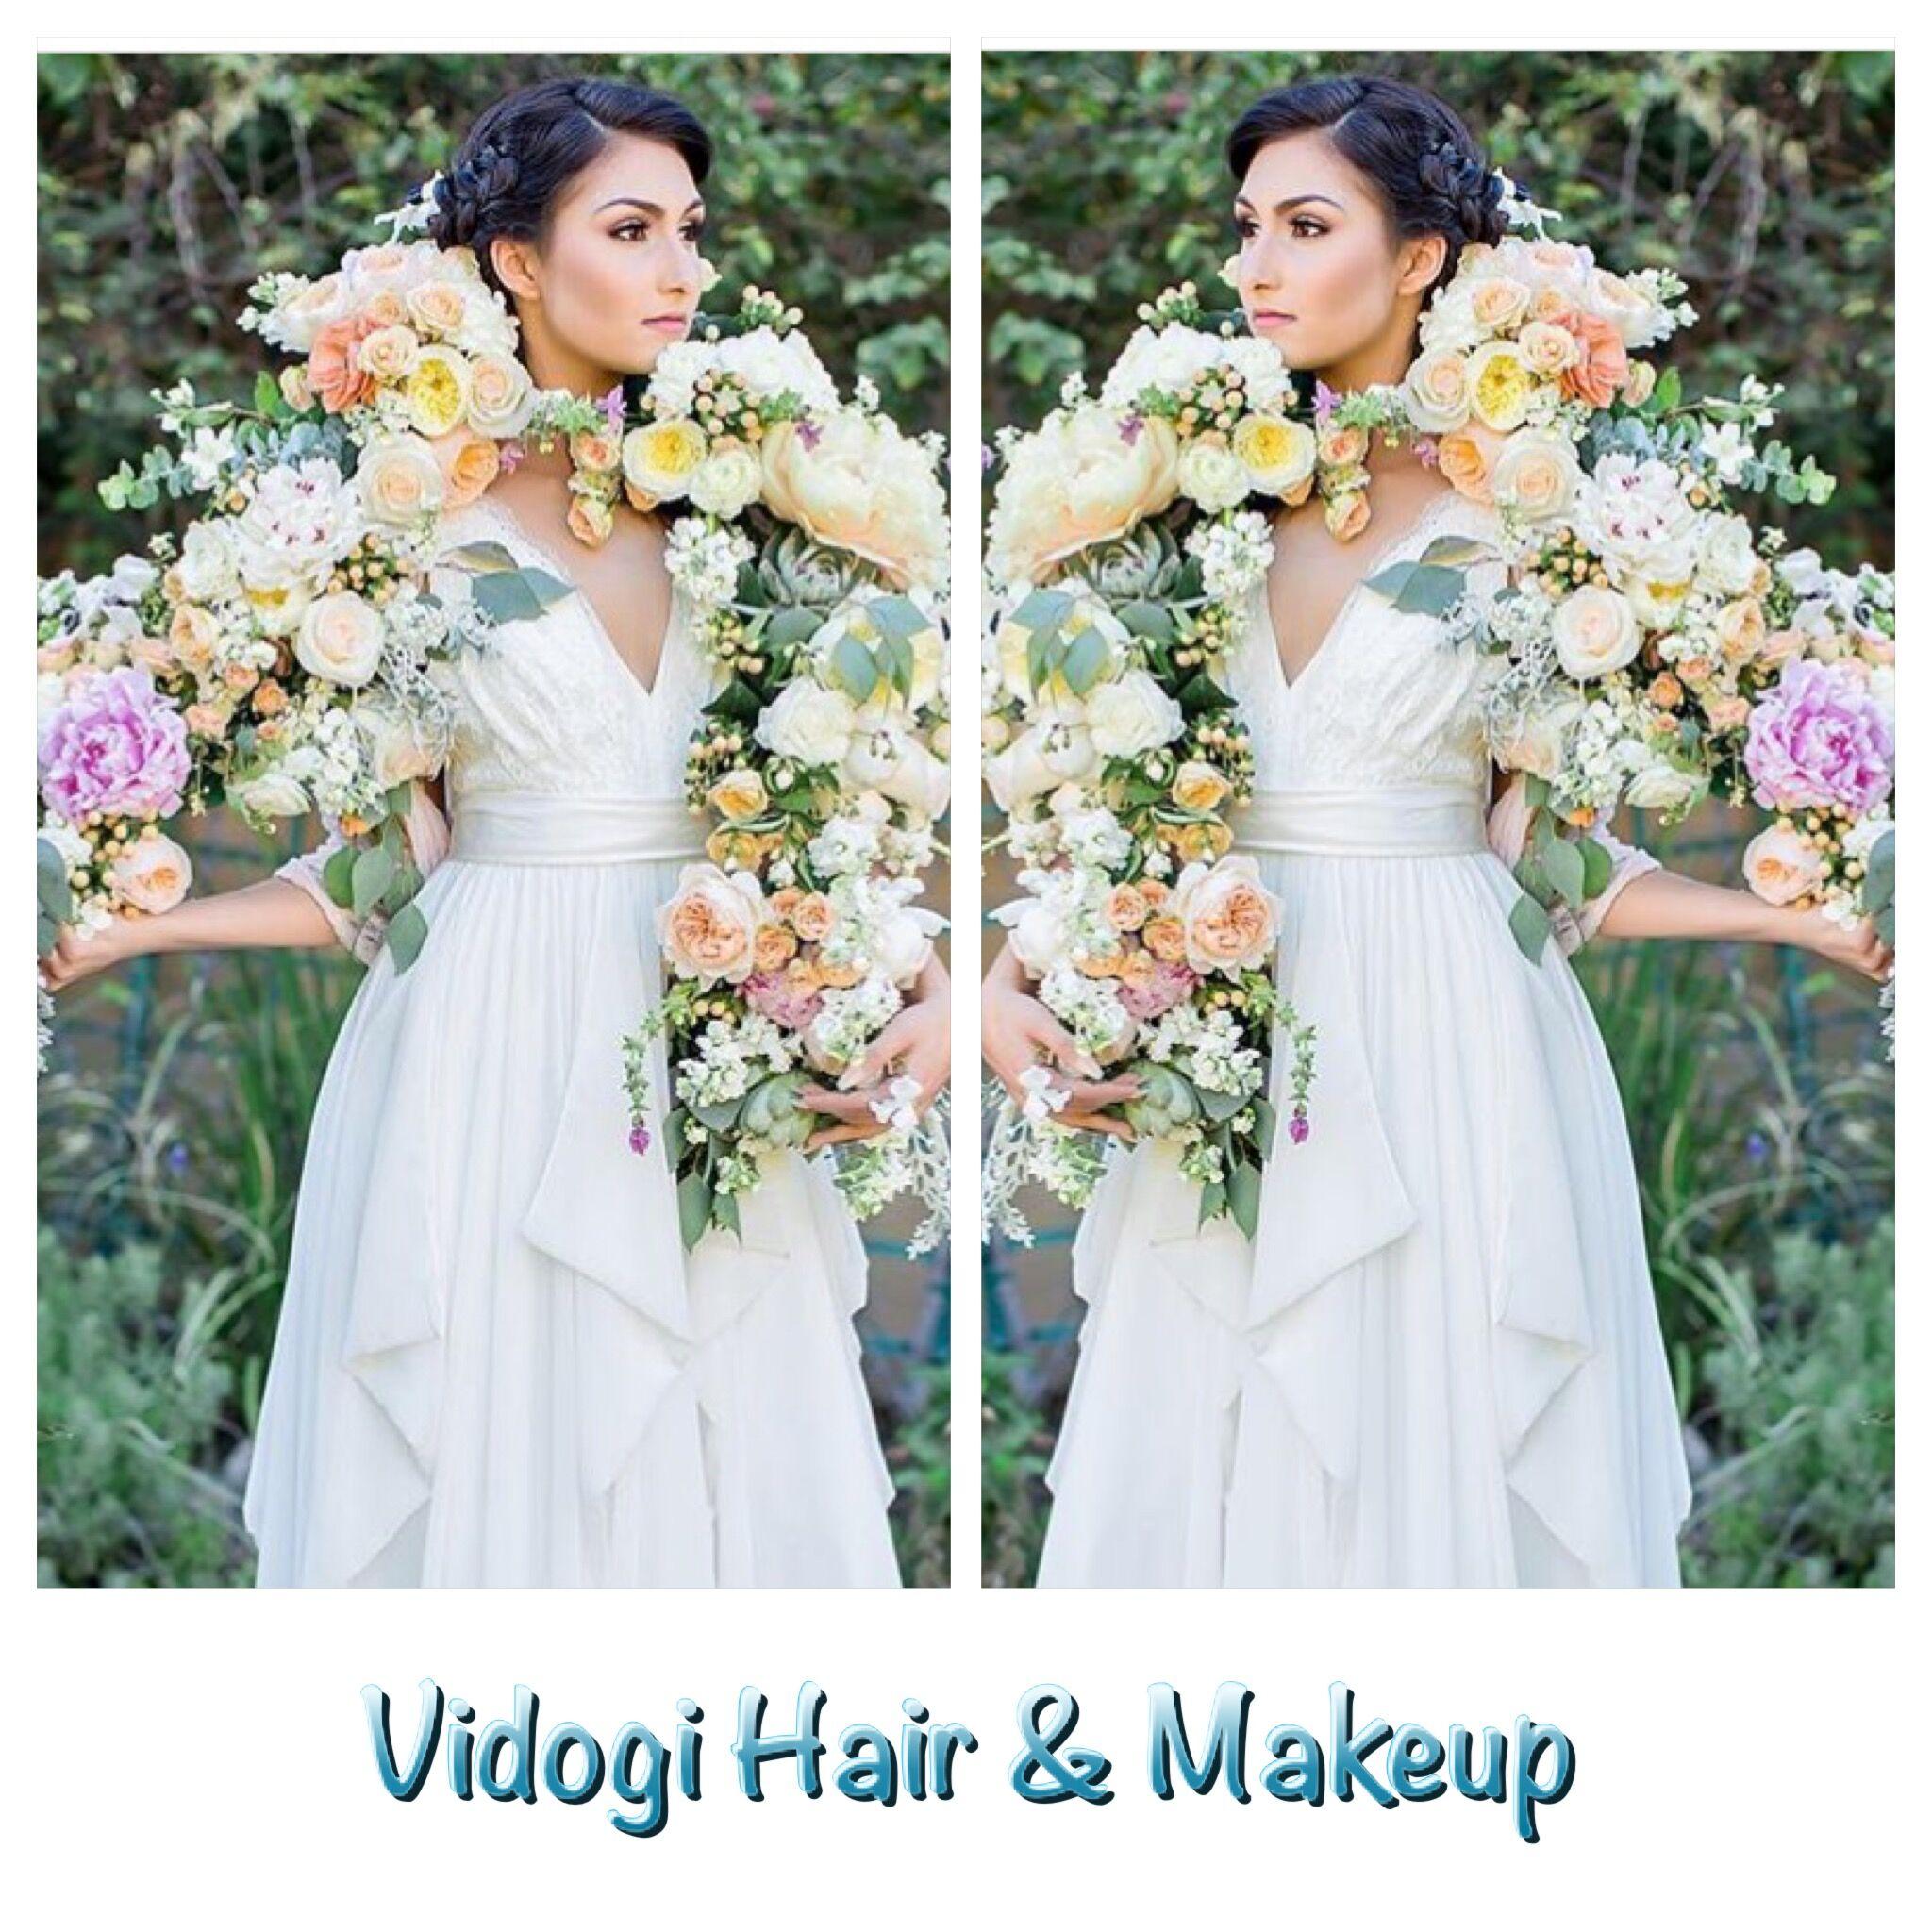 denise bridal hair & makeup (vidogi salon) | beauty